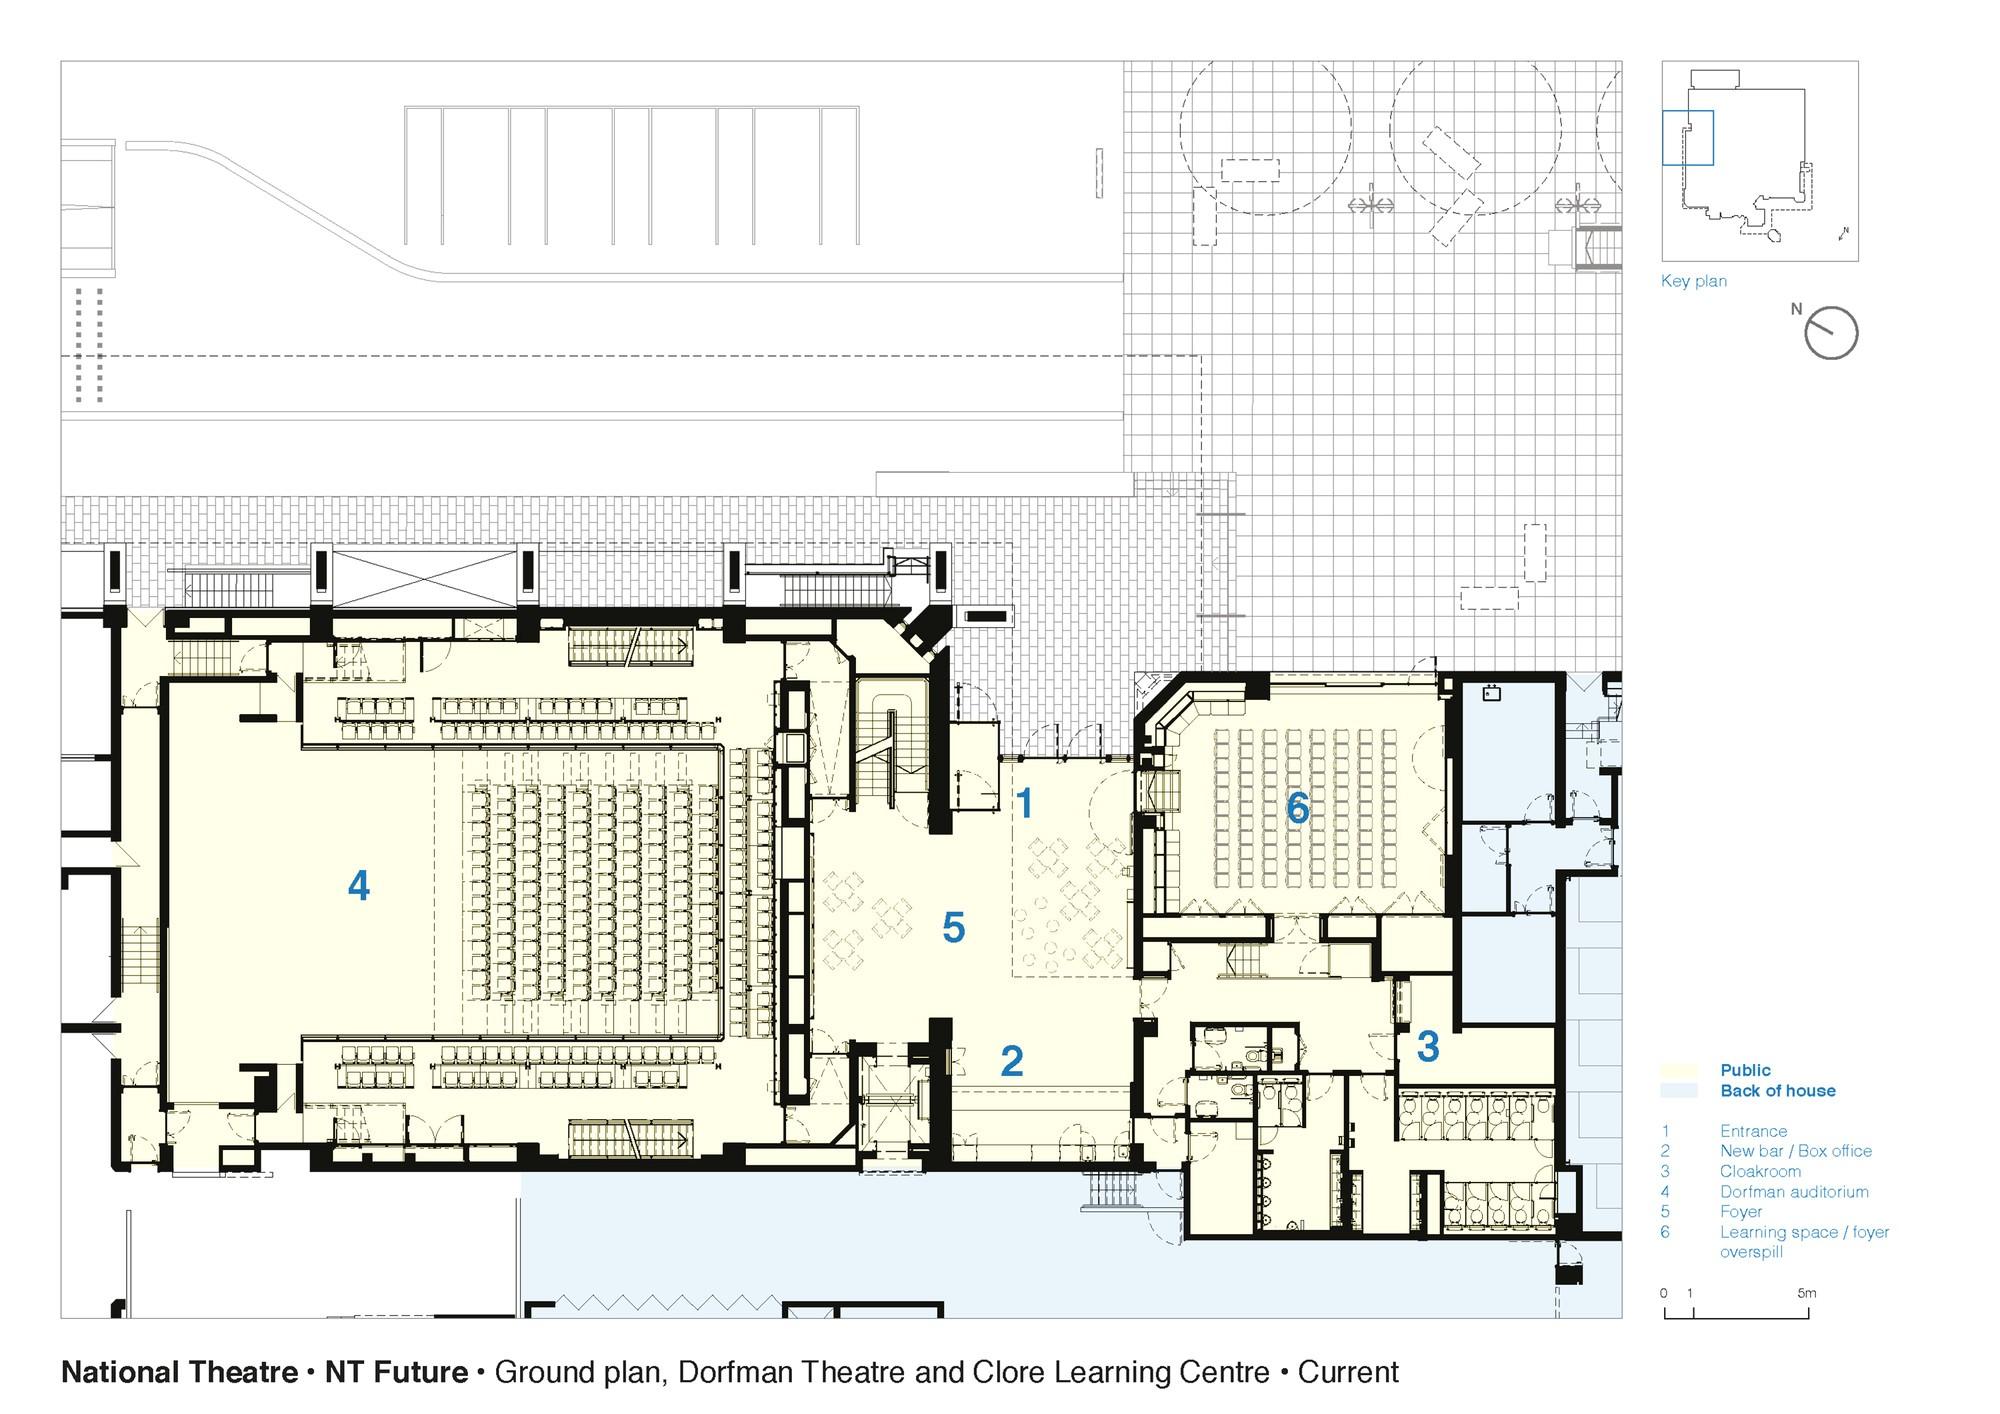 555bce54e58ece6a9f0001b3 national theatre haworth tompkins ground floor plan dorfman theatre